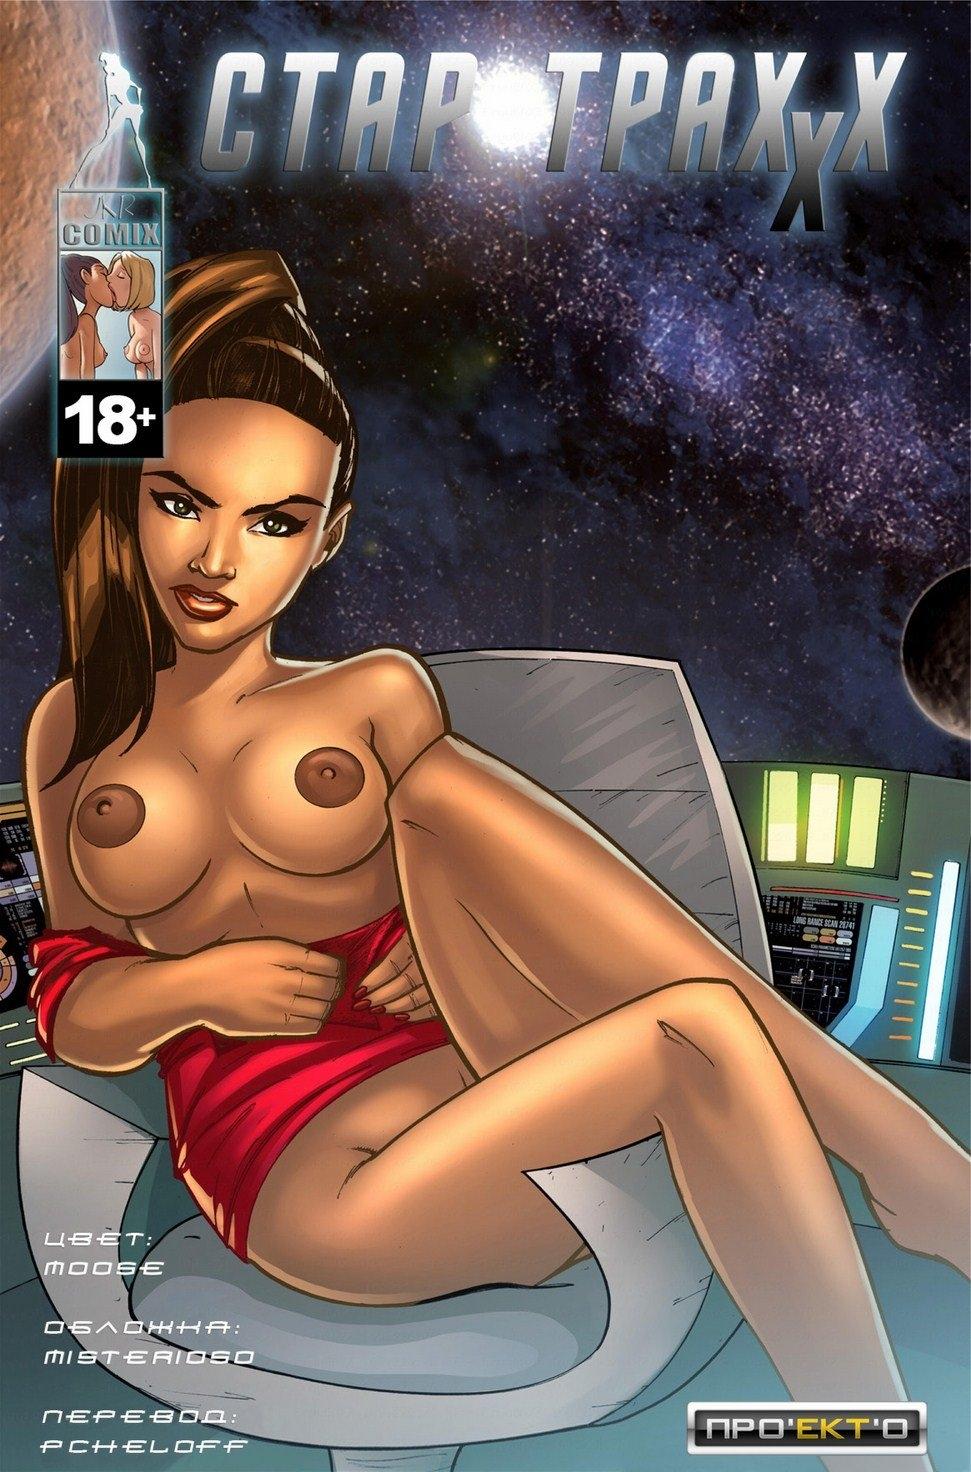 SureFap xxx porno Star Trek - [JKRcomix] - Star Trexxx